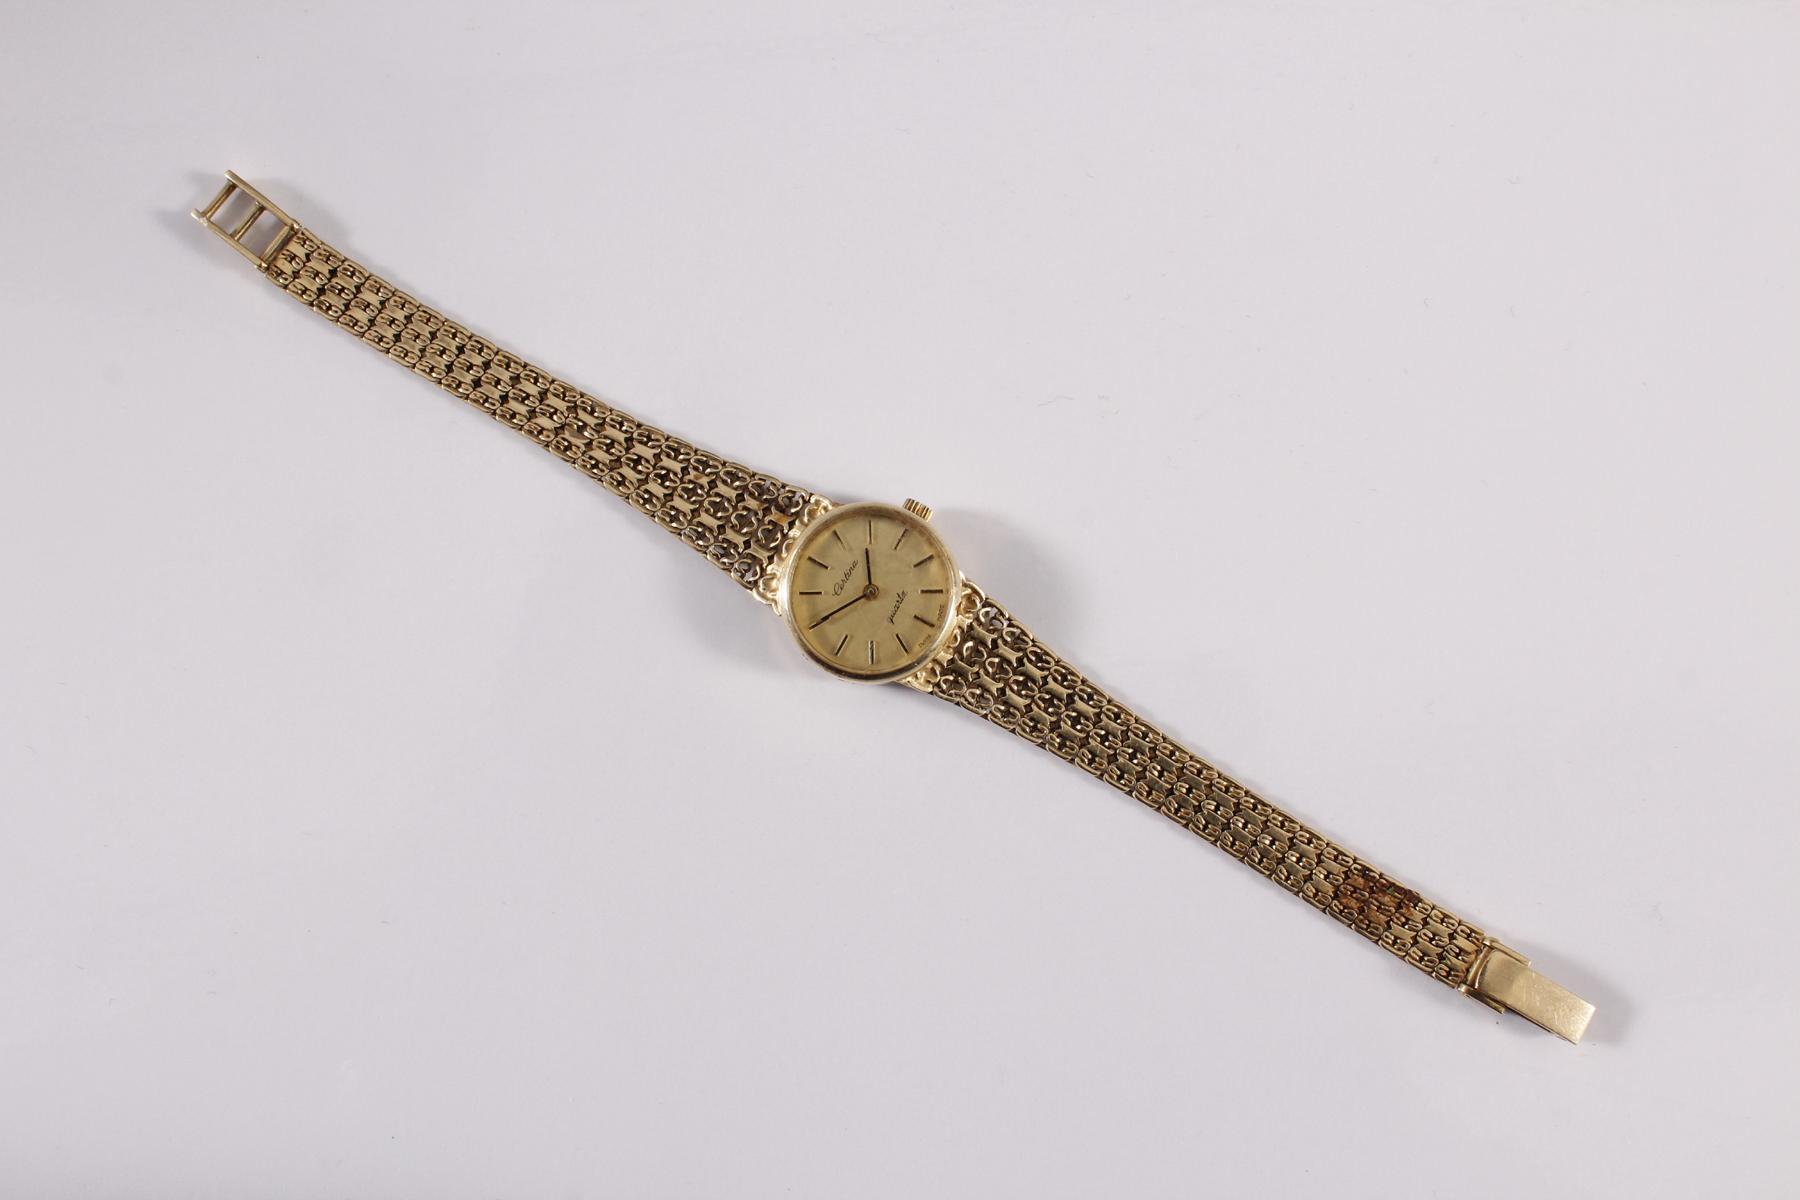 Damenarmbanduhr der Marke Sertina, 14 kt Gelbgold